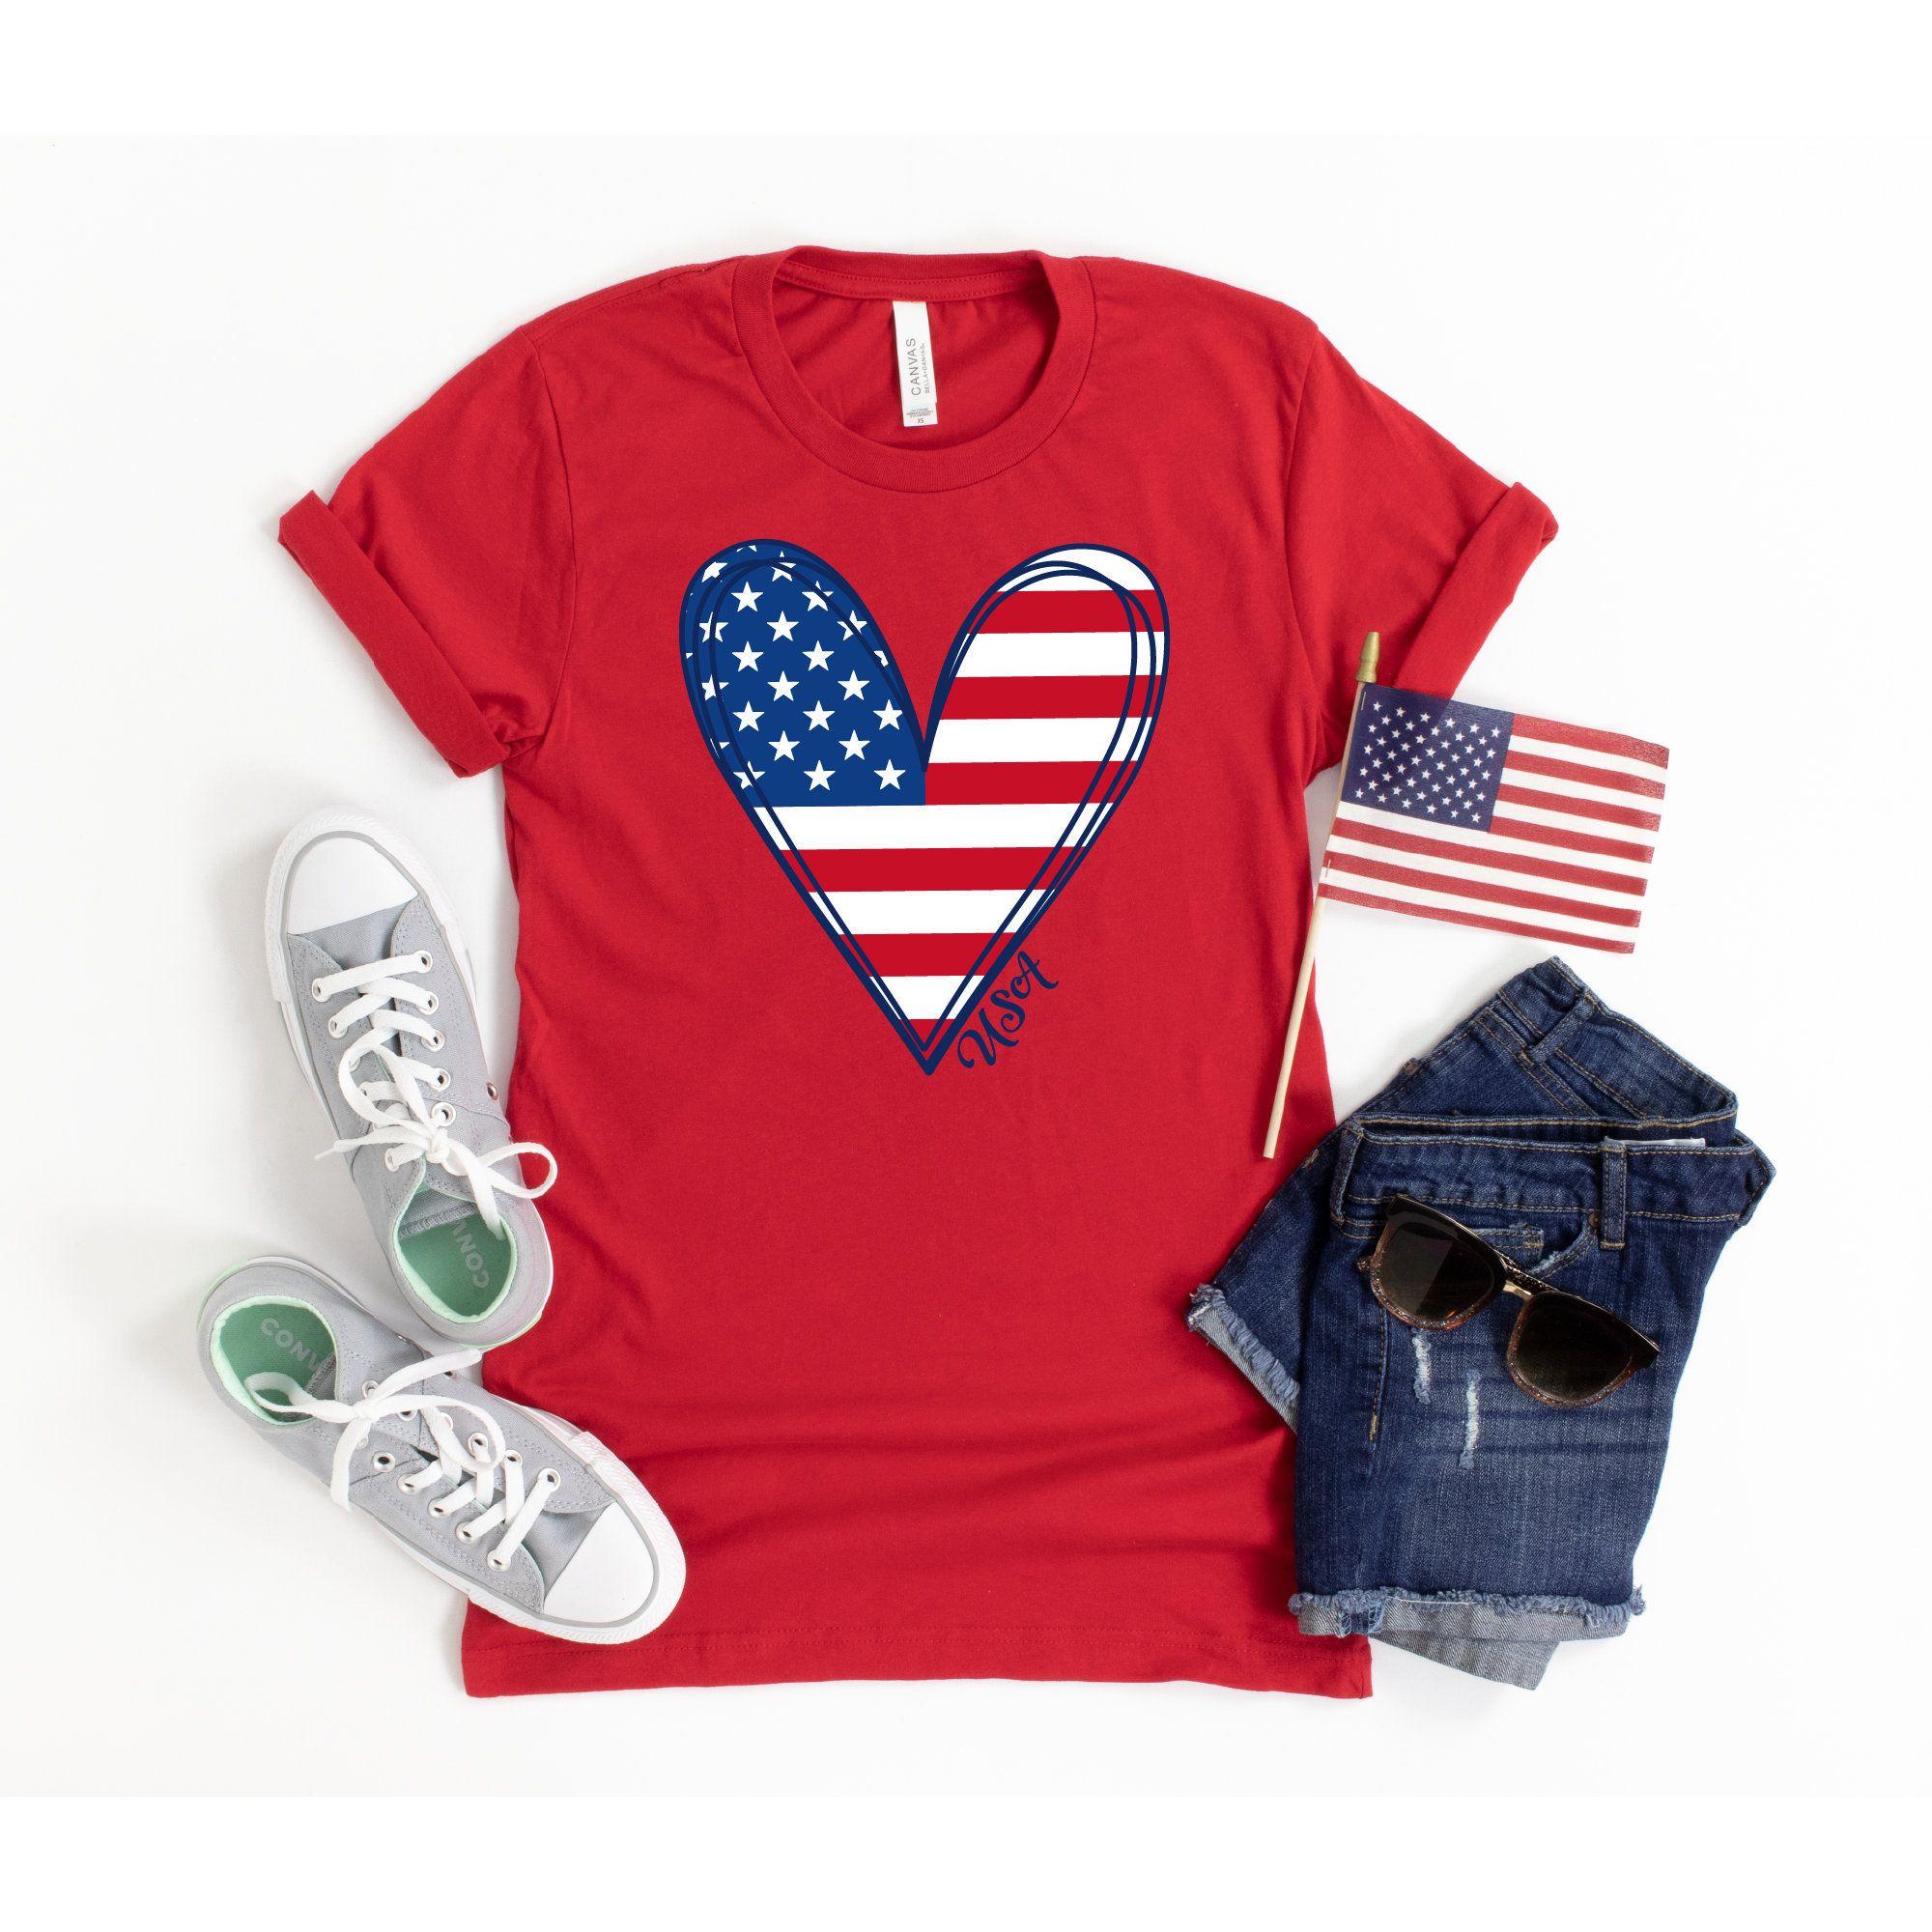 American Flag Shirt 4th Of July Shirt Women Usa Shirt July Etsy In 2020 Womens Shirts Blue Shirt Women Fourth Of July Shirts